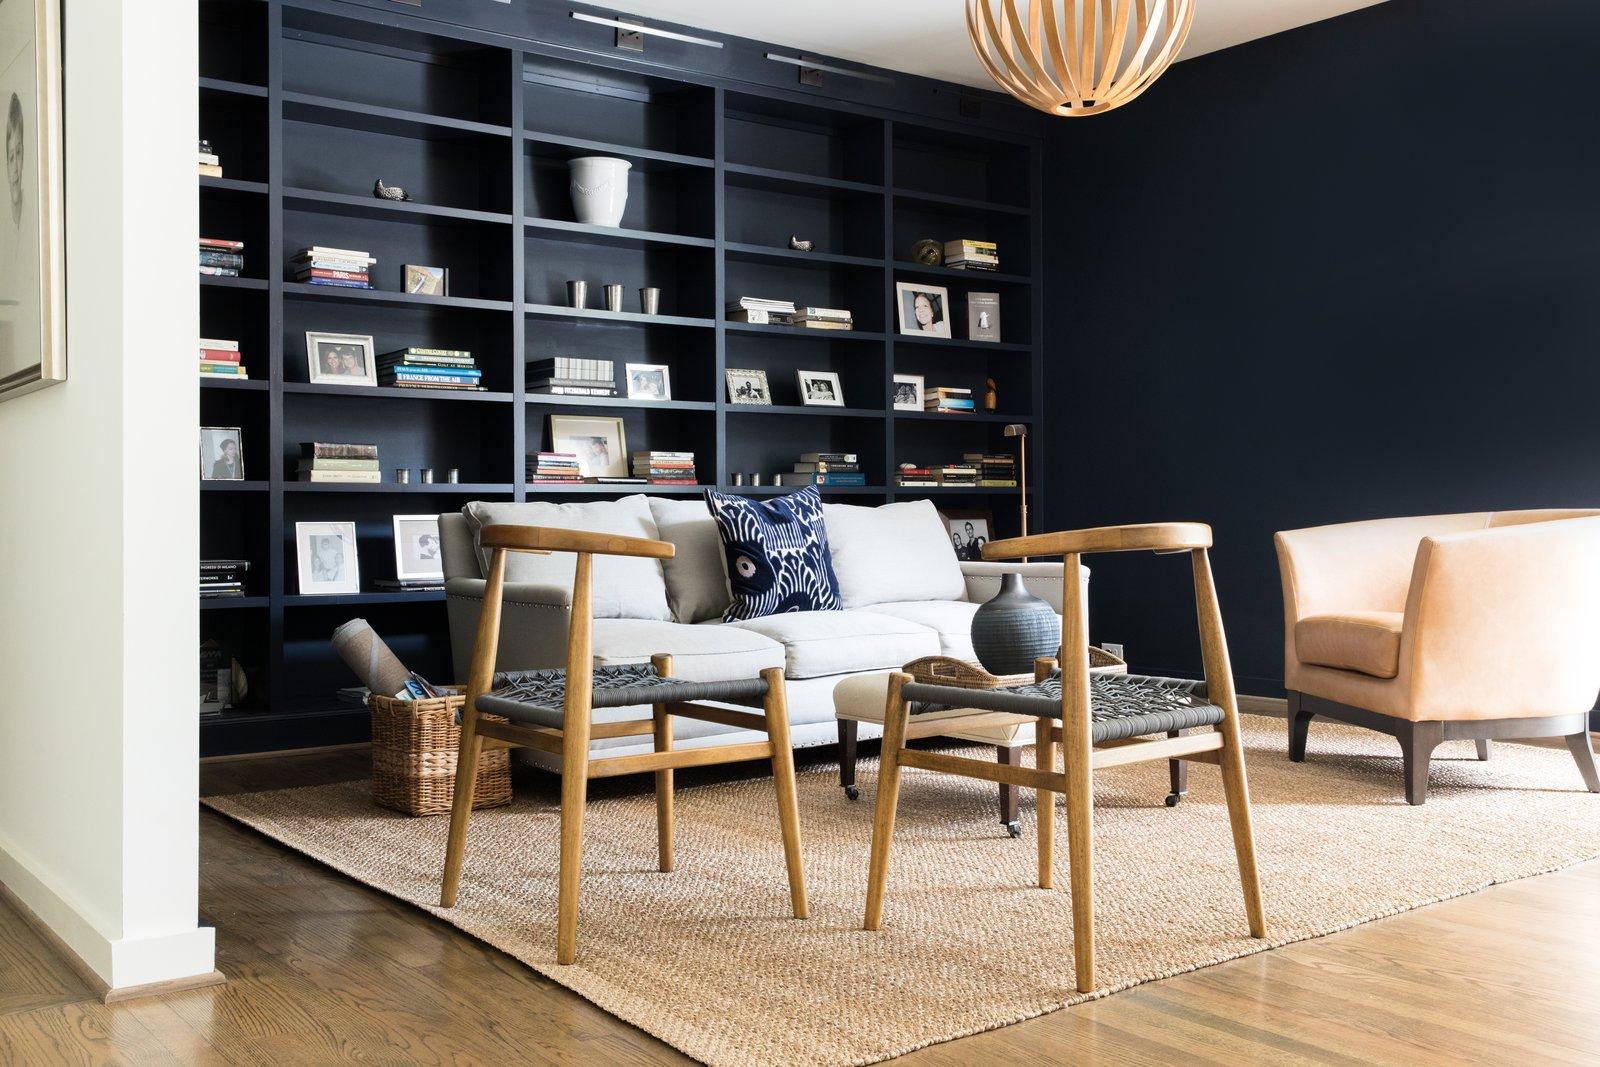 Office, Shelves, Medium Hardwood Floor, Bookcase, Study Room Type, and Lamps Study for relaxing and reading  Guinn/Henderson Residence